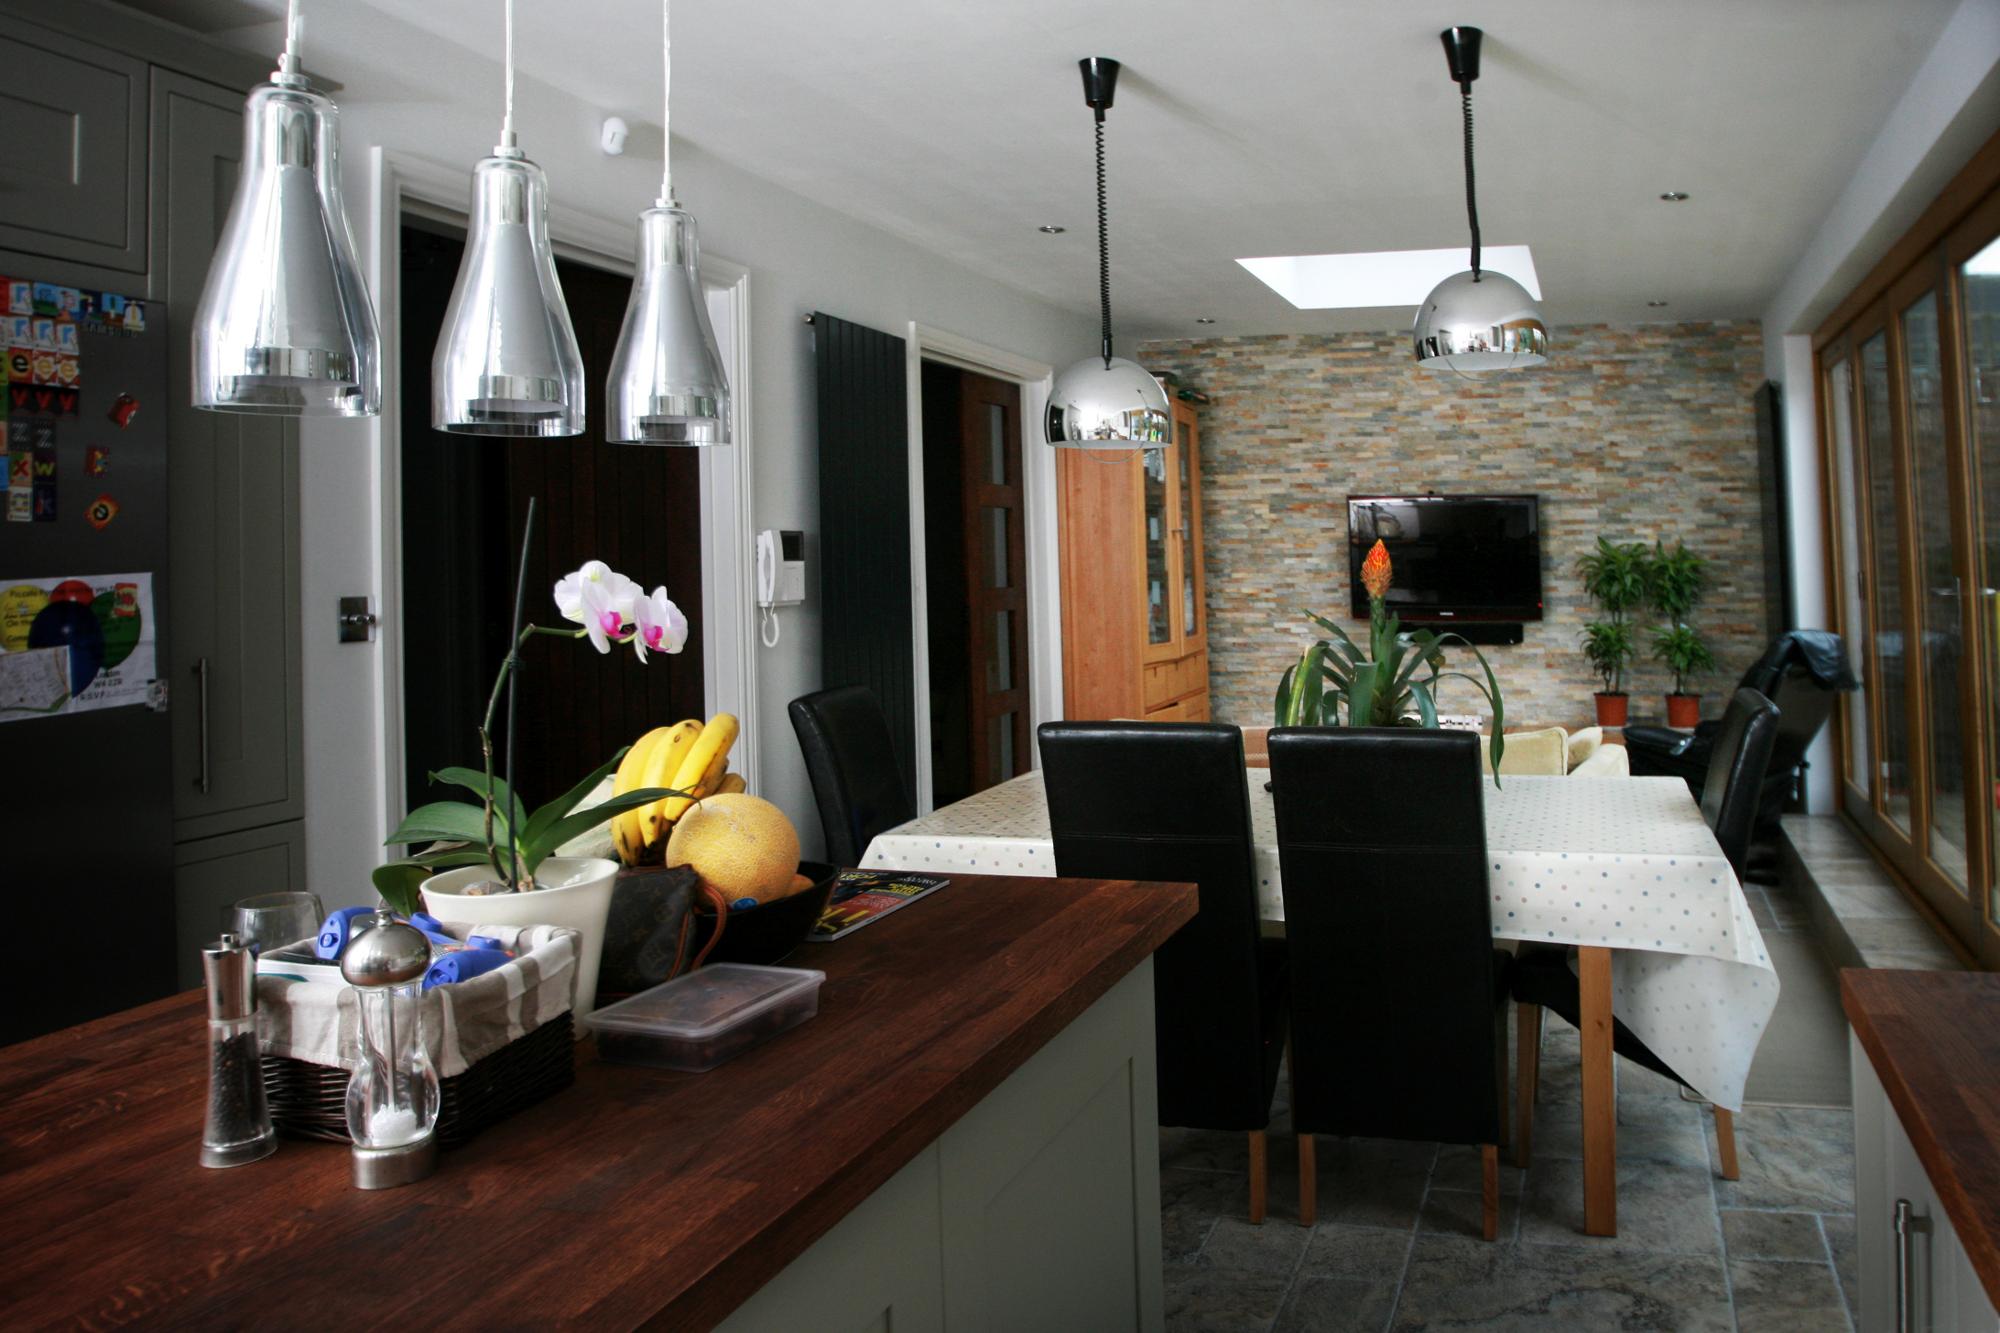 Kitchen extension chiswick hounslow w4 goastudio for Kitchen extension ideas uk